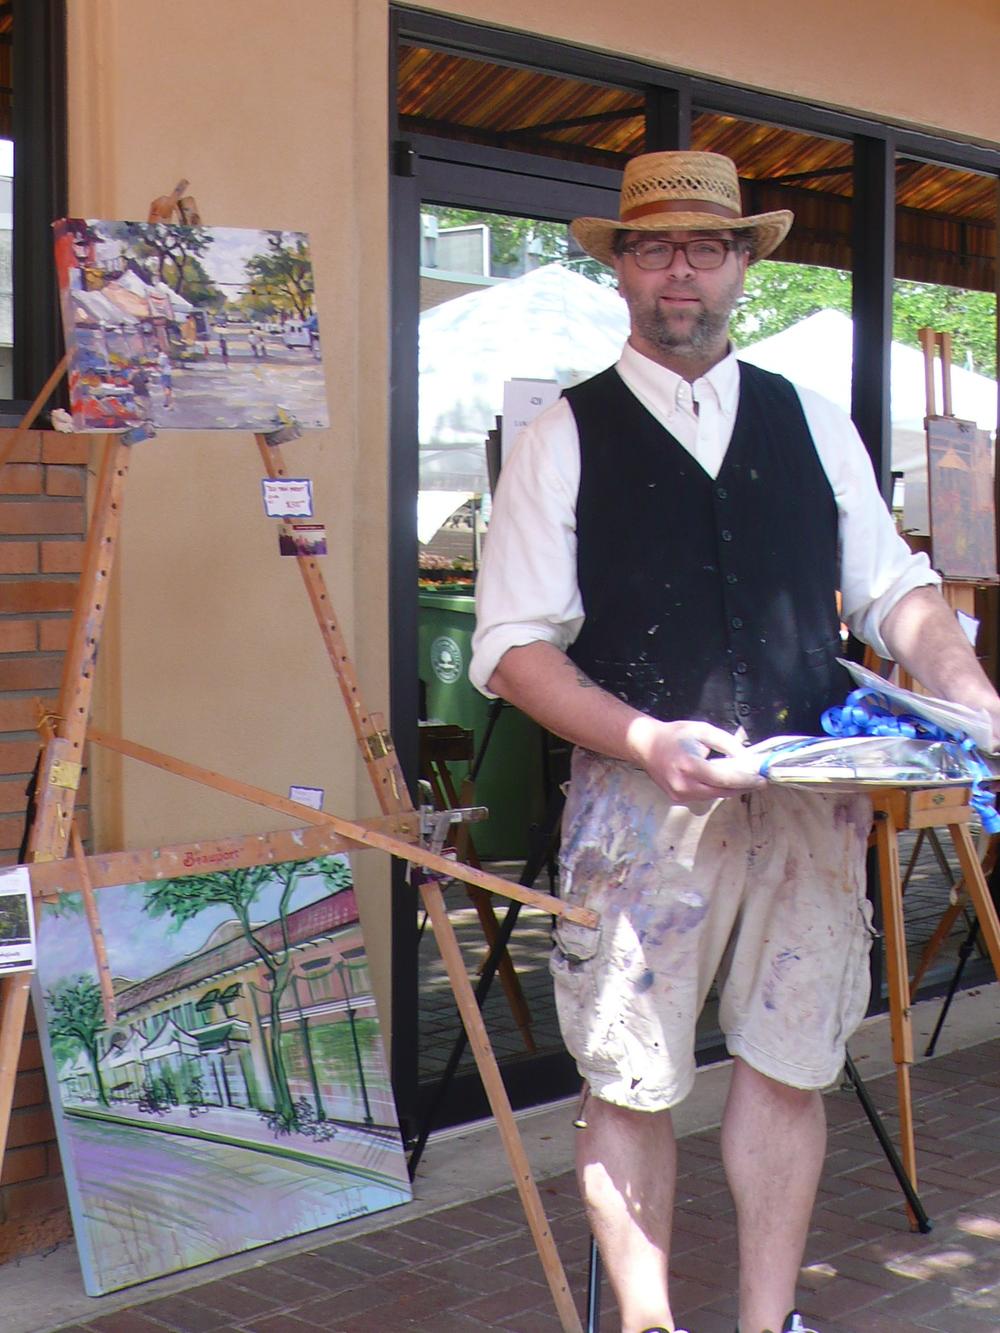 Award-winning Artist Jason Prigge